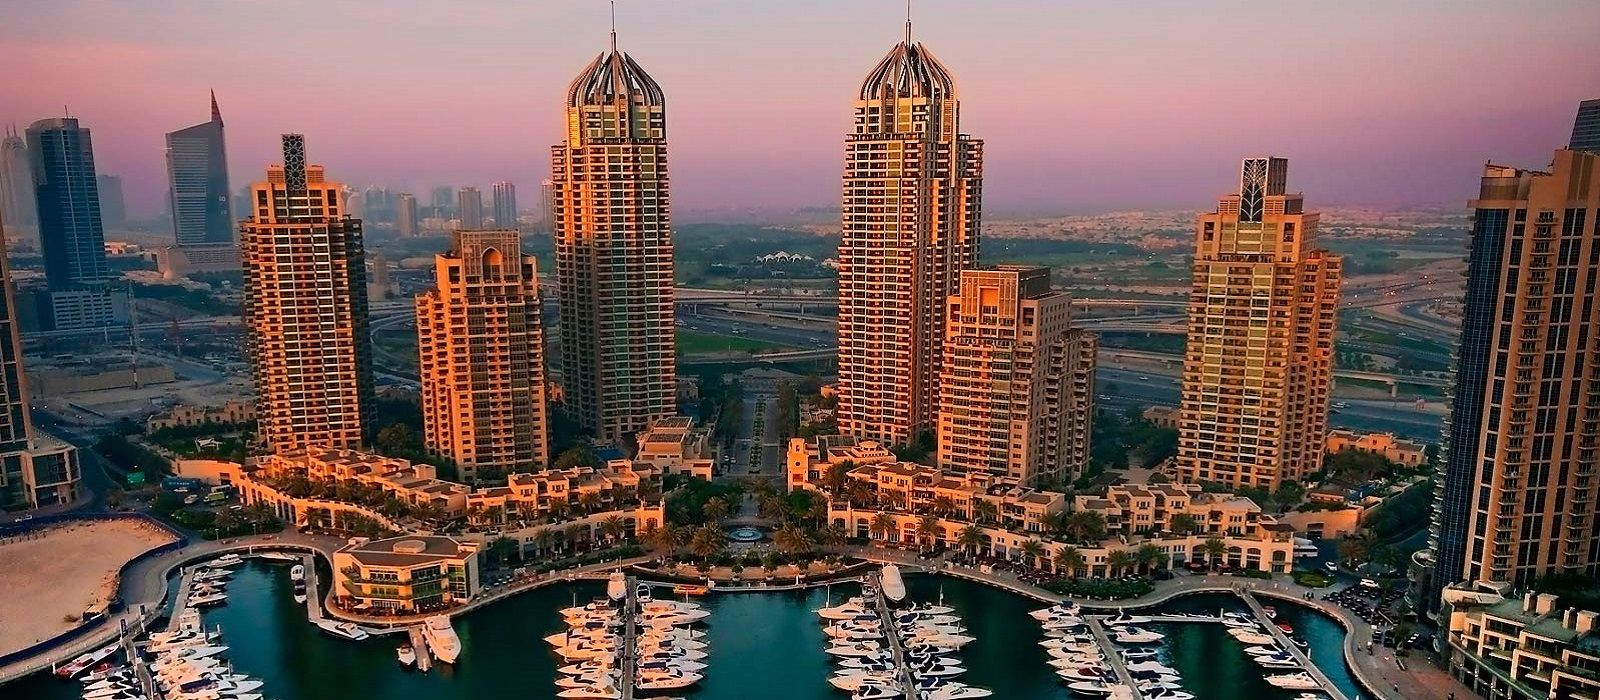 Golden Triangle & Dubai Delights Tour Trip 3